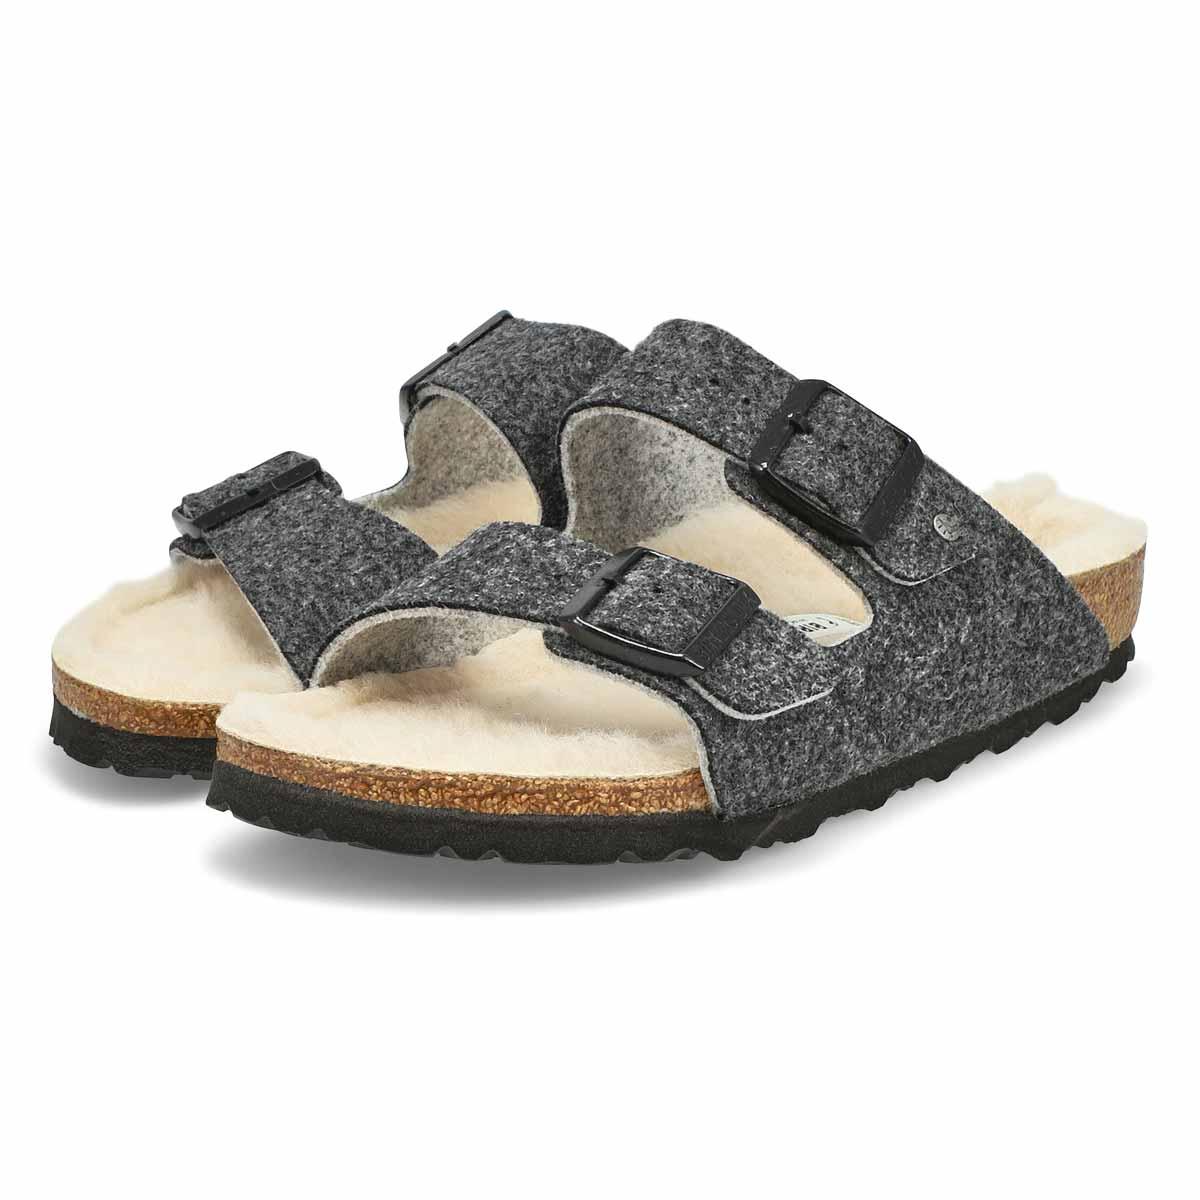 Sandale ARIZONA, anthracite, femmes - Étroite